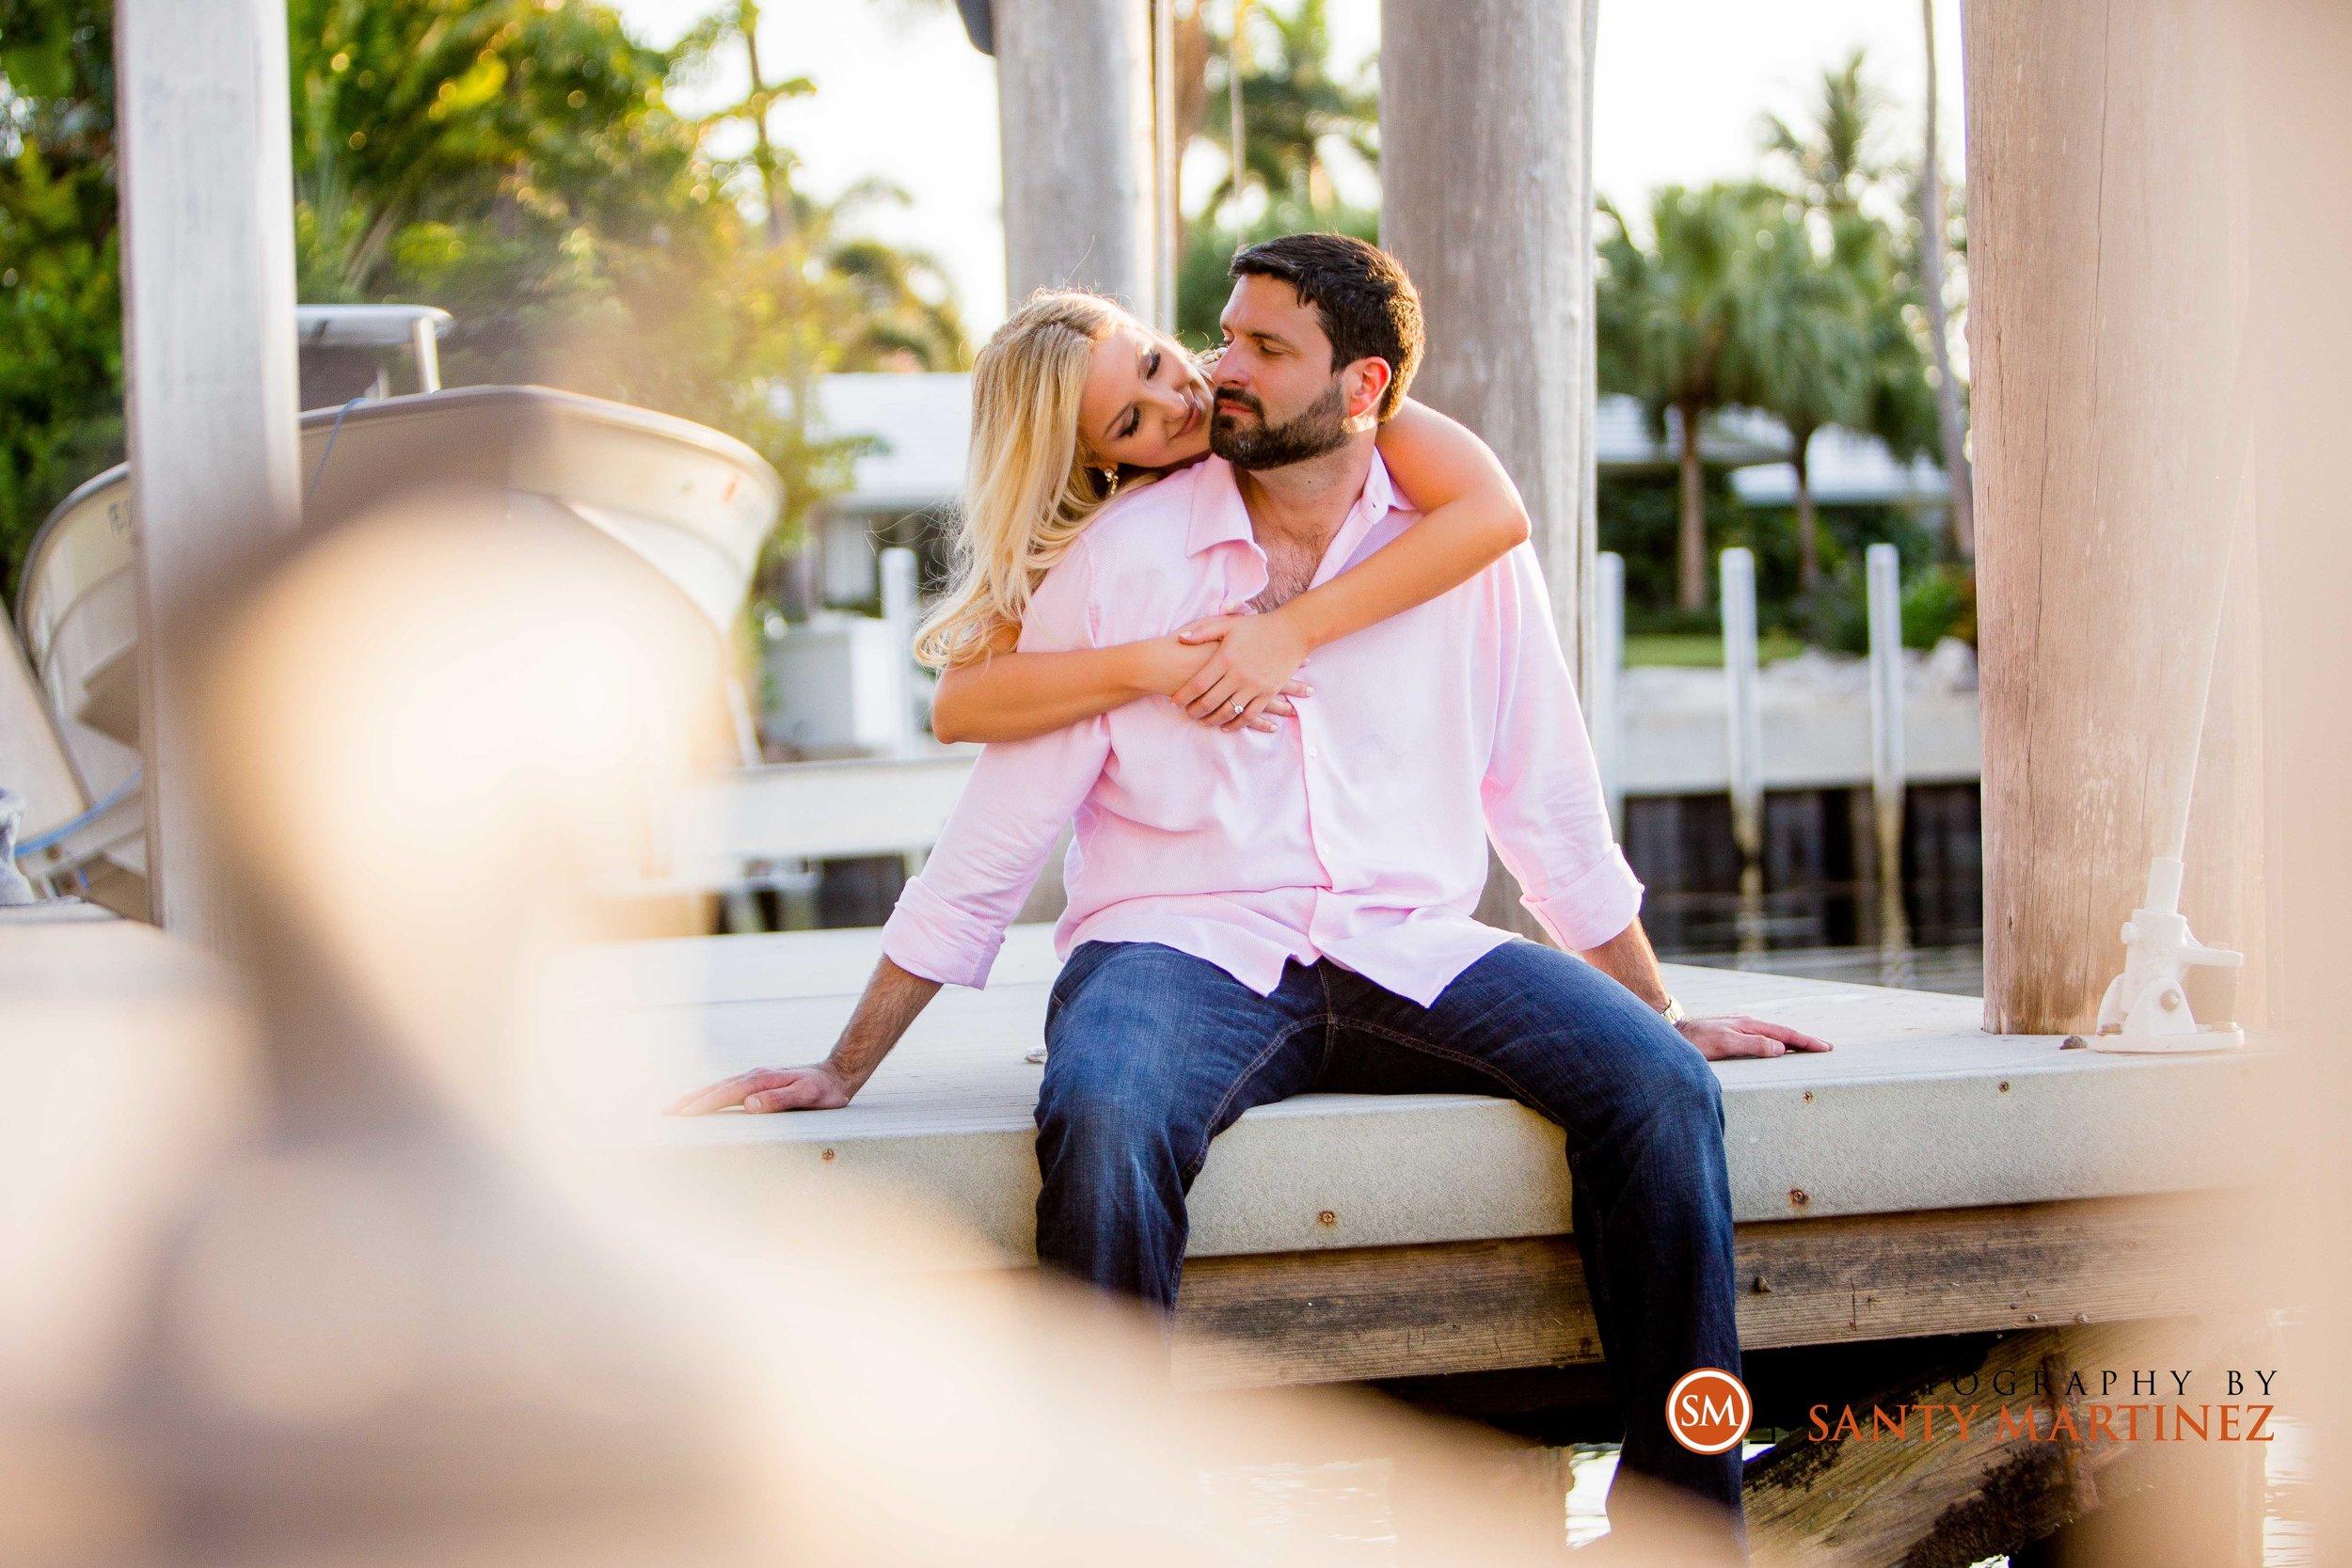 Photography by Santy Martinez - Miami Wedding Photographer-13.jpg